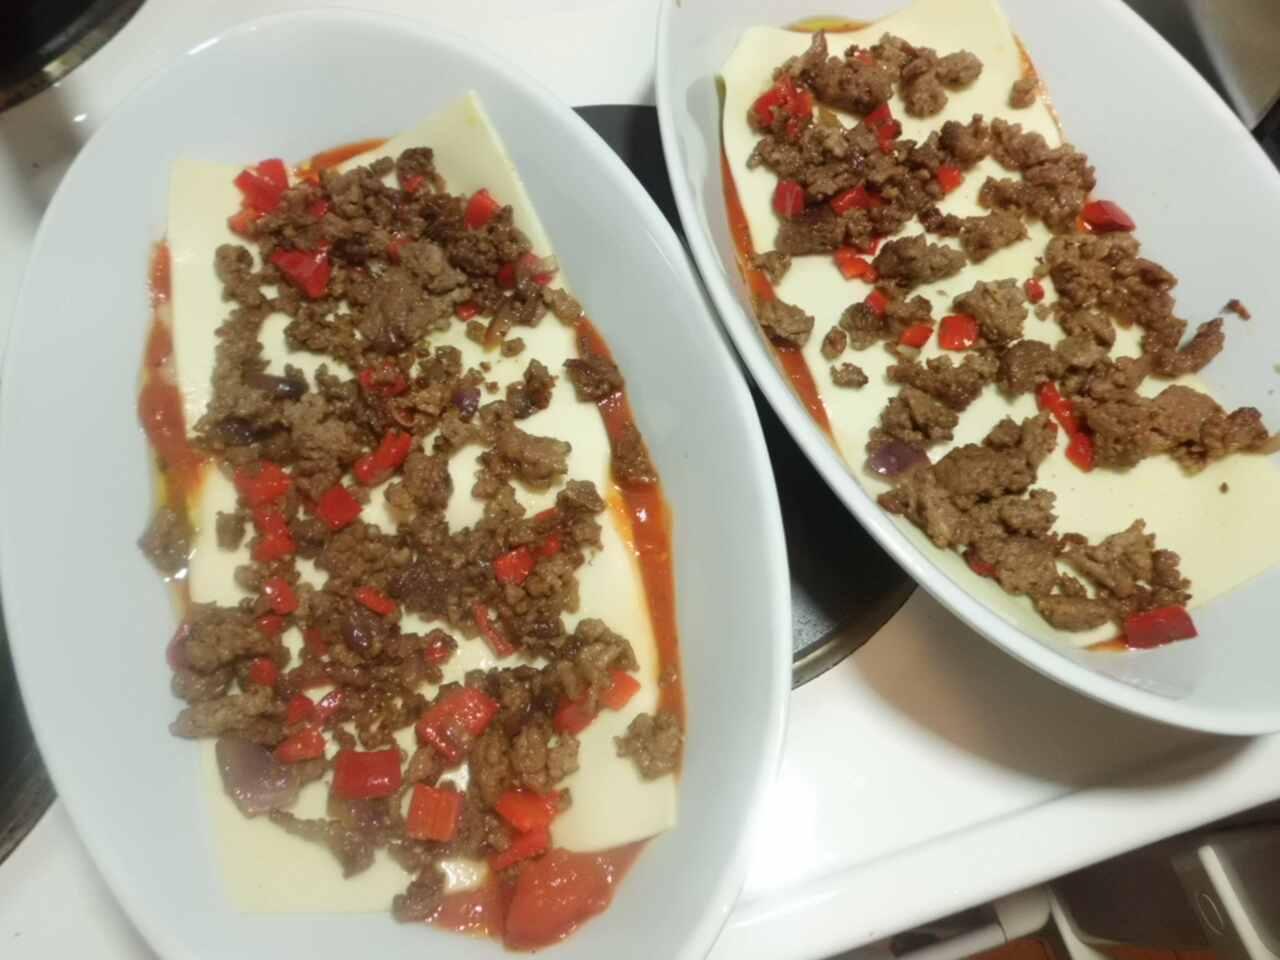 Lasagneblätter in 3 Minuten fertig schichten, Tomatensauce,Lasagneplatten, Hackfleisch, Béchamelsauce usw